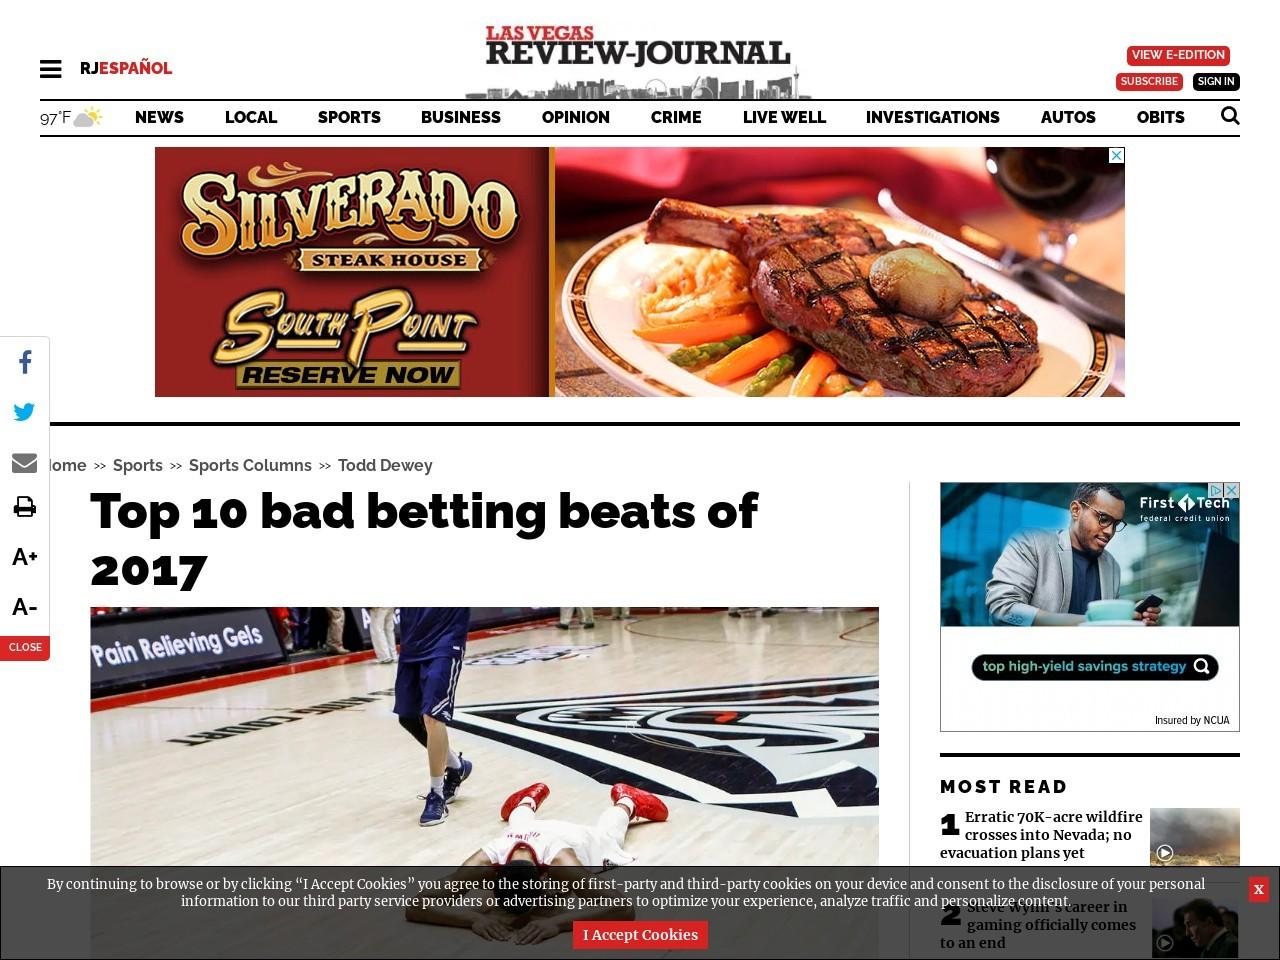 Top 10 bad betting beats of 2017